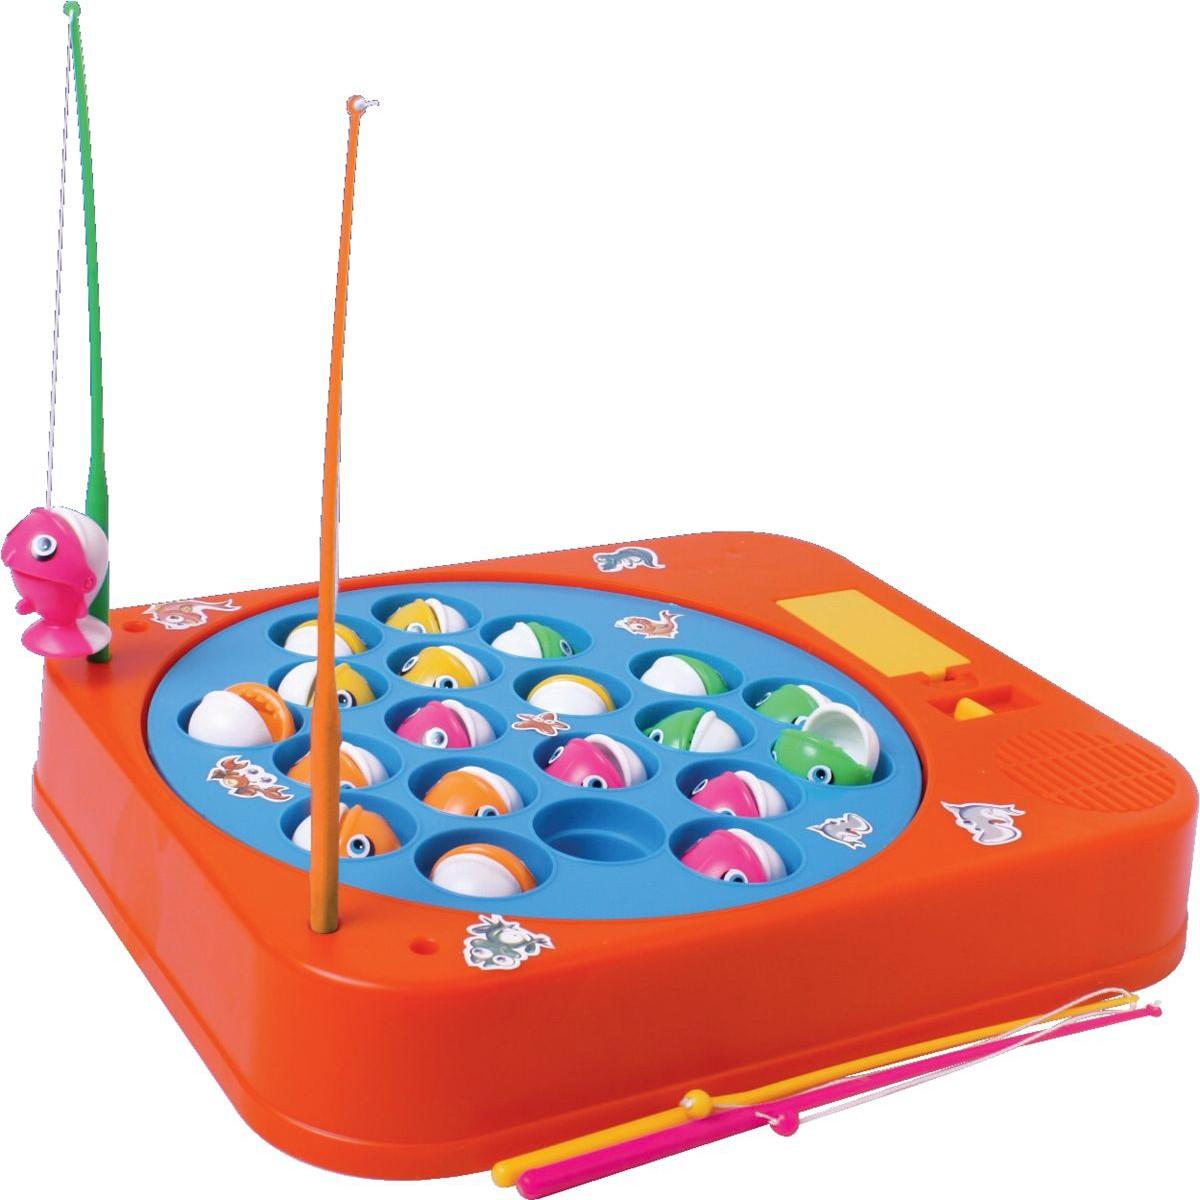 jouet peche a la ligne